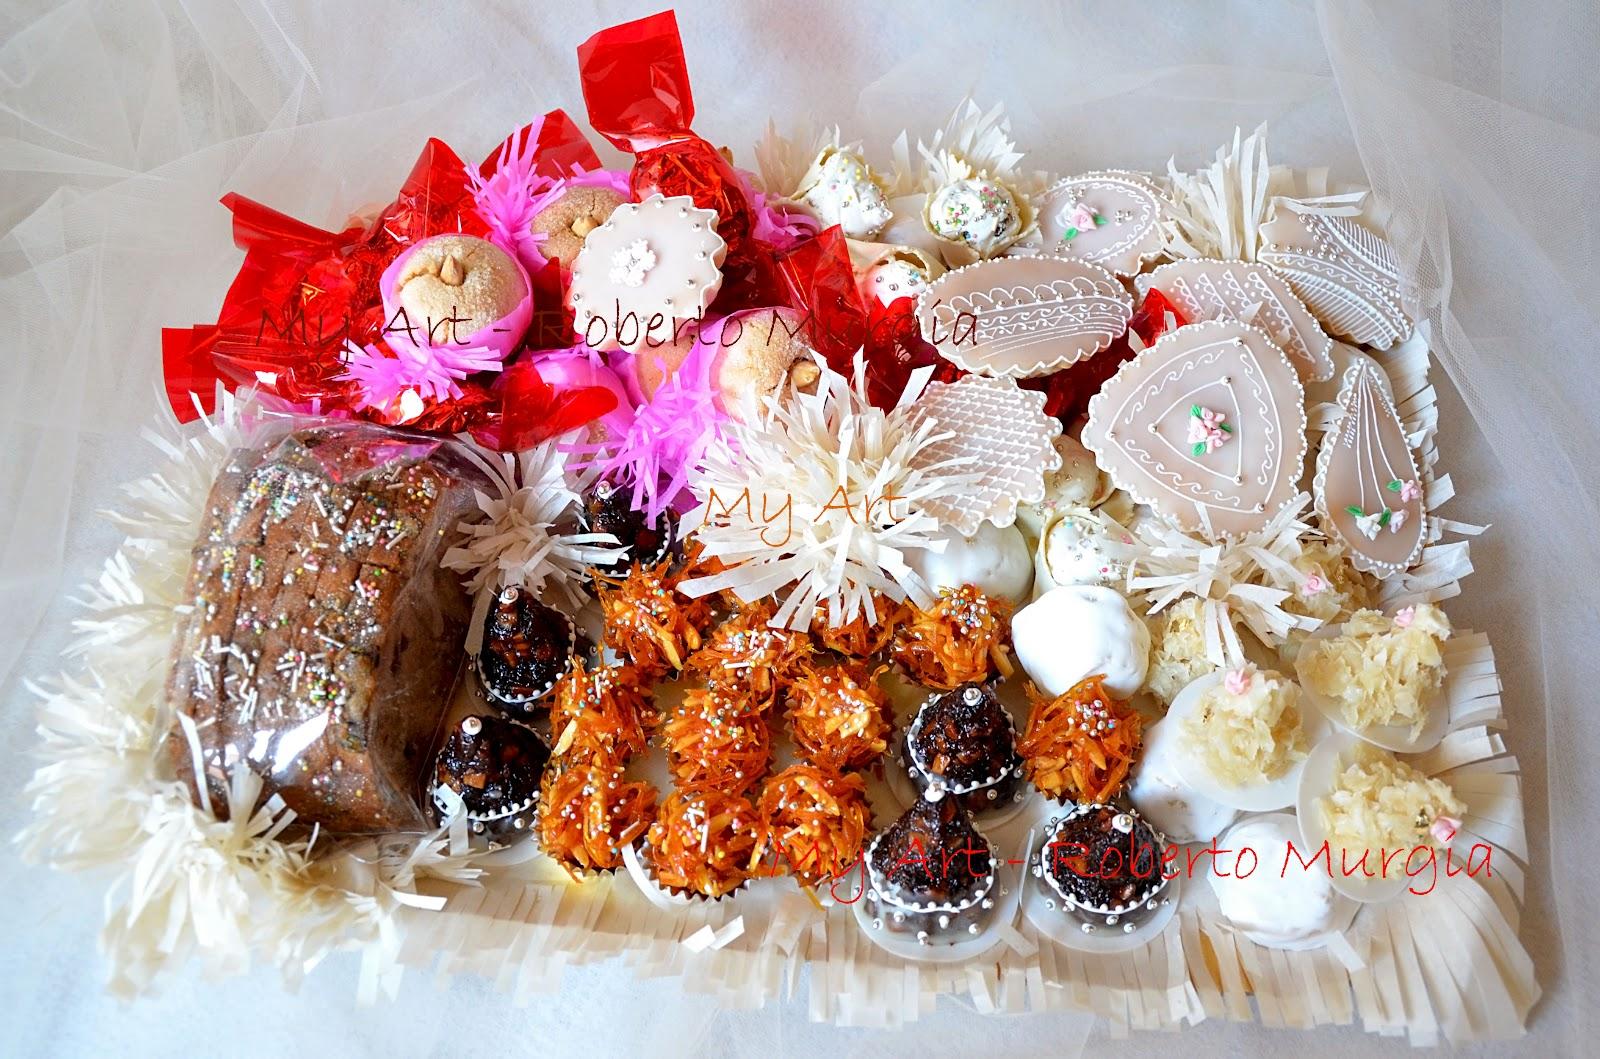 My art roberto murgia un vassoio di dolci sardi for Ricette dolci sardi